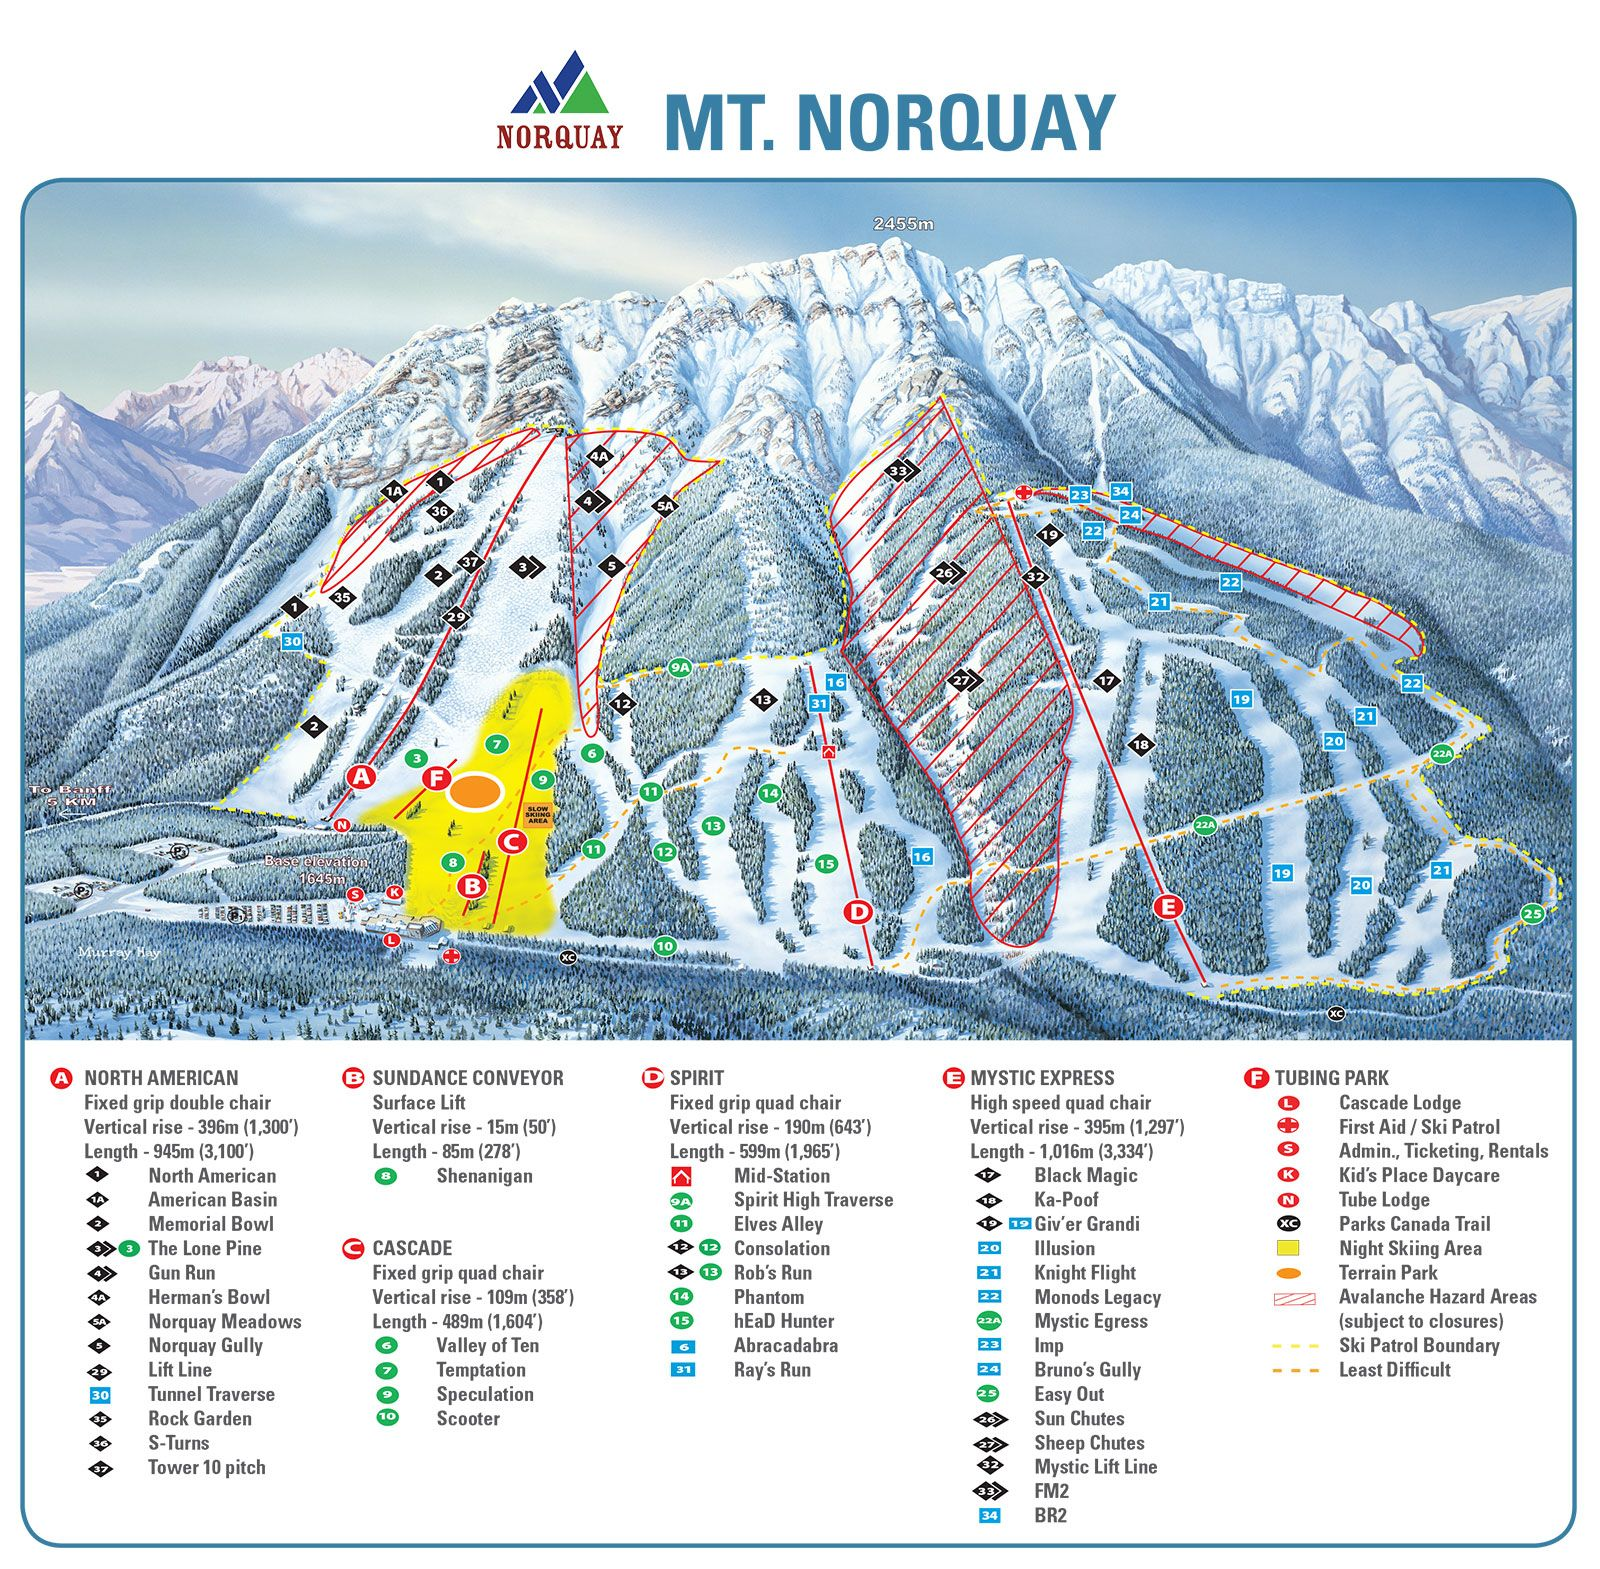 Map Of Canada Lake Louise.Banff Trail Maps Ski Banff Lake Louise Sunshine Skiing Trail